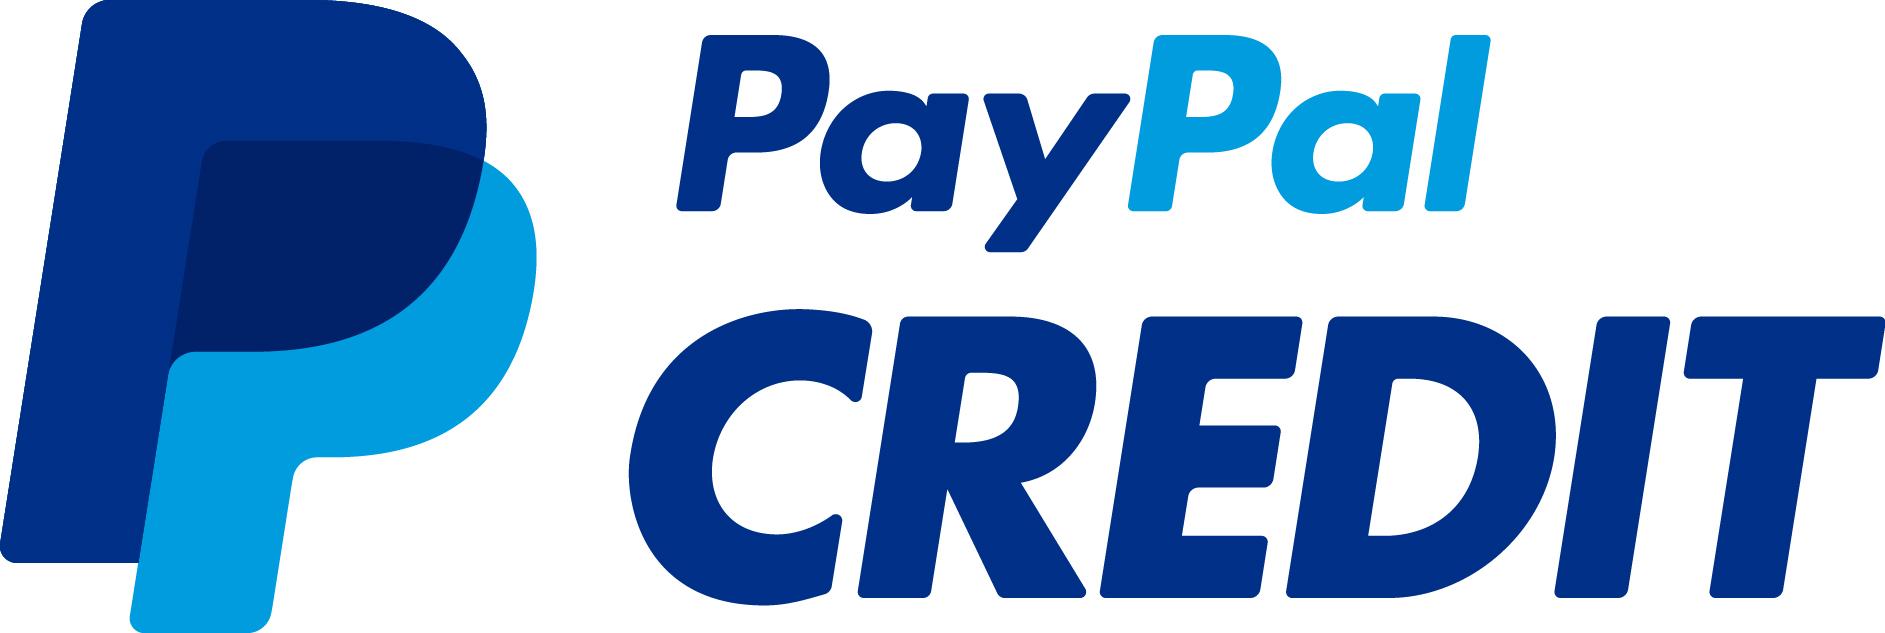 paypal-credit-logo-v2.jpg